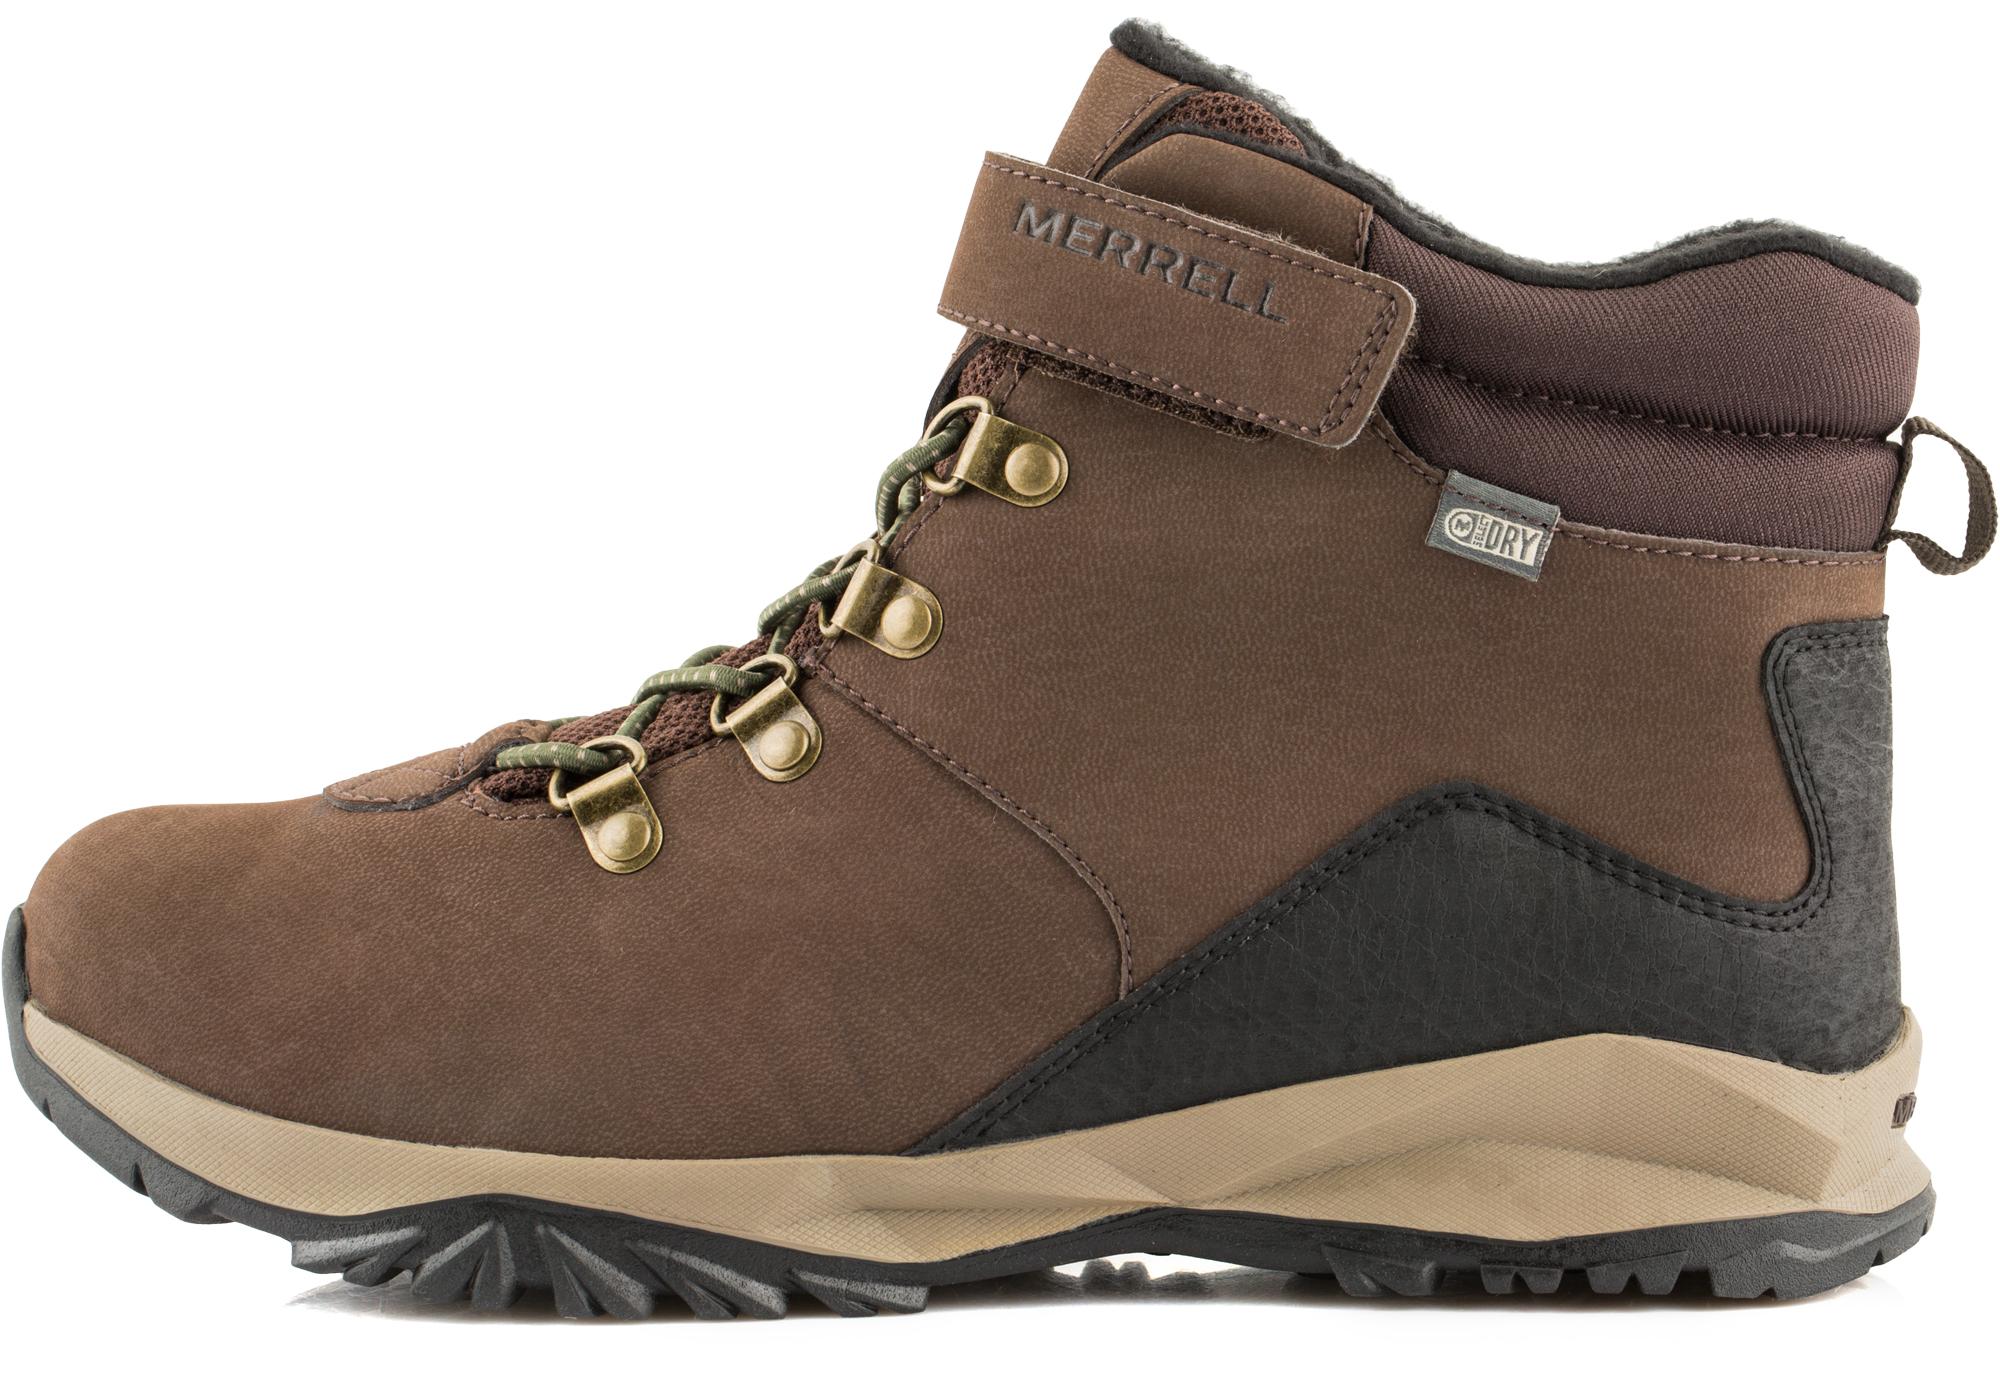 Merrell Ботинки для мальчиков Merrell Apline, размер 40,5